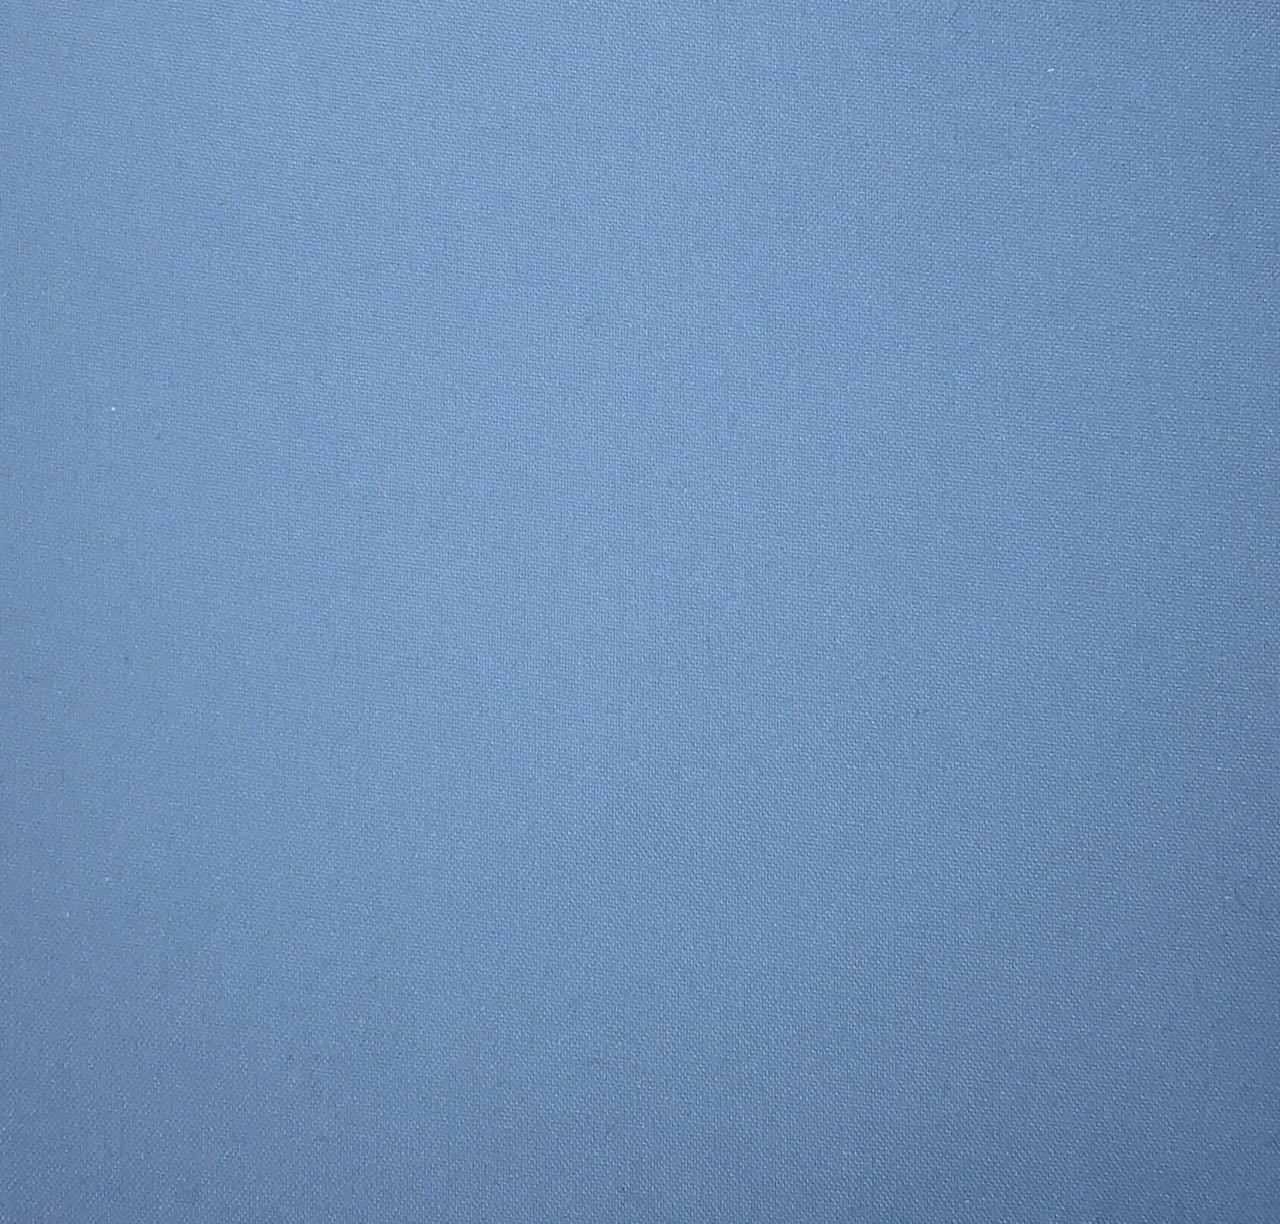 Polyester face/Pile Velour Back - Baby Blue/Gray